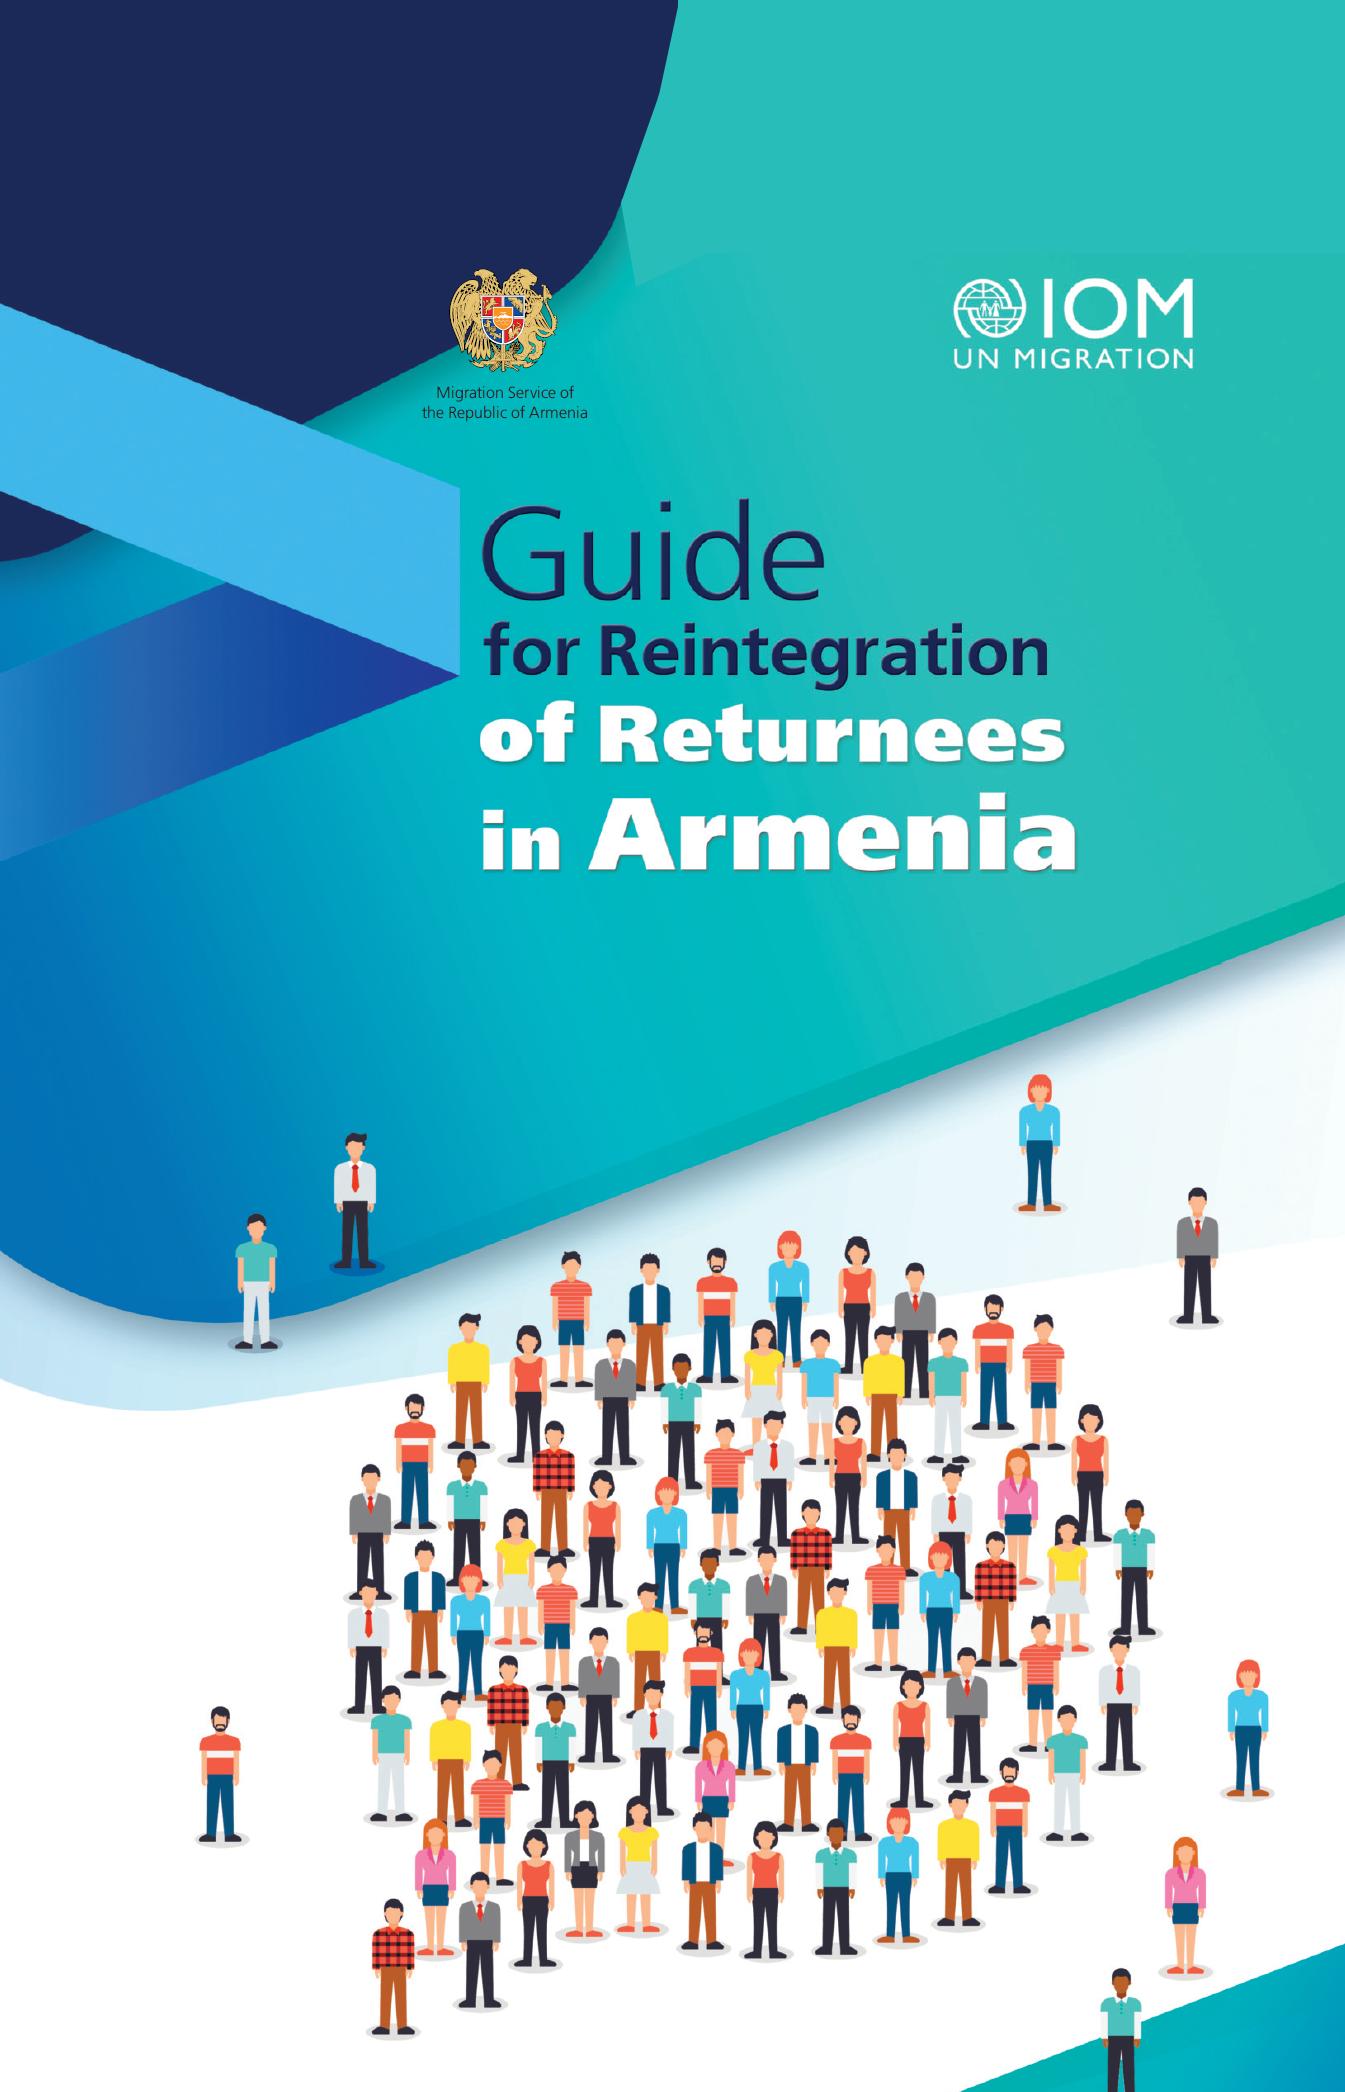 Reintegration of Returnees in Armenia